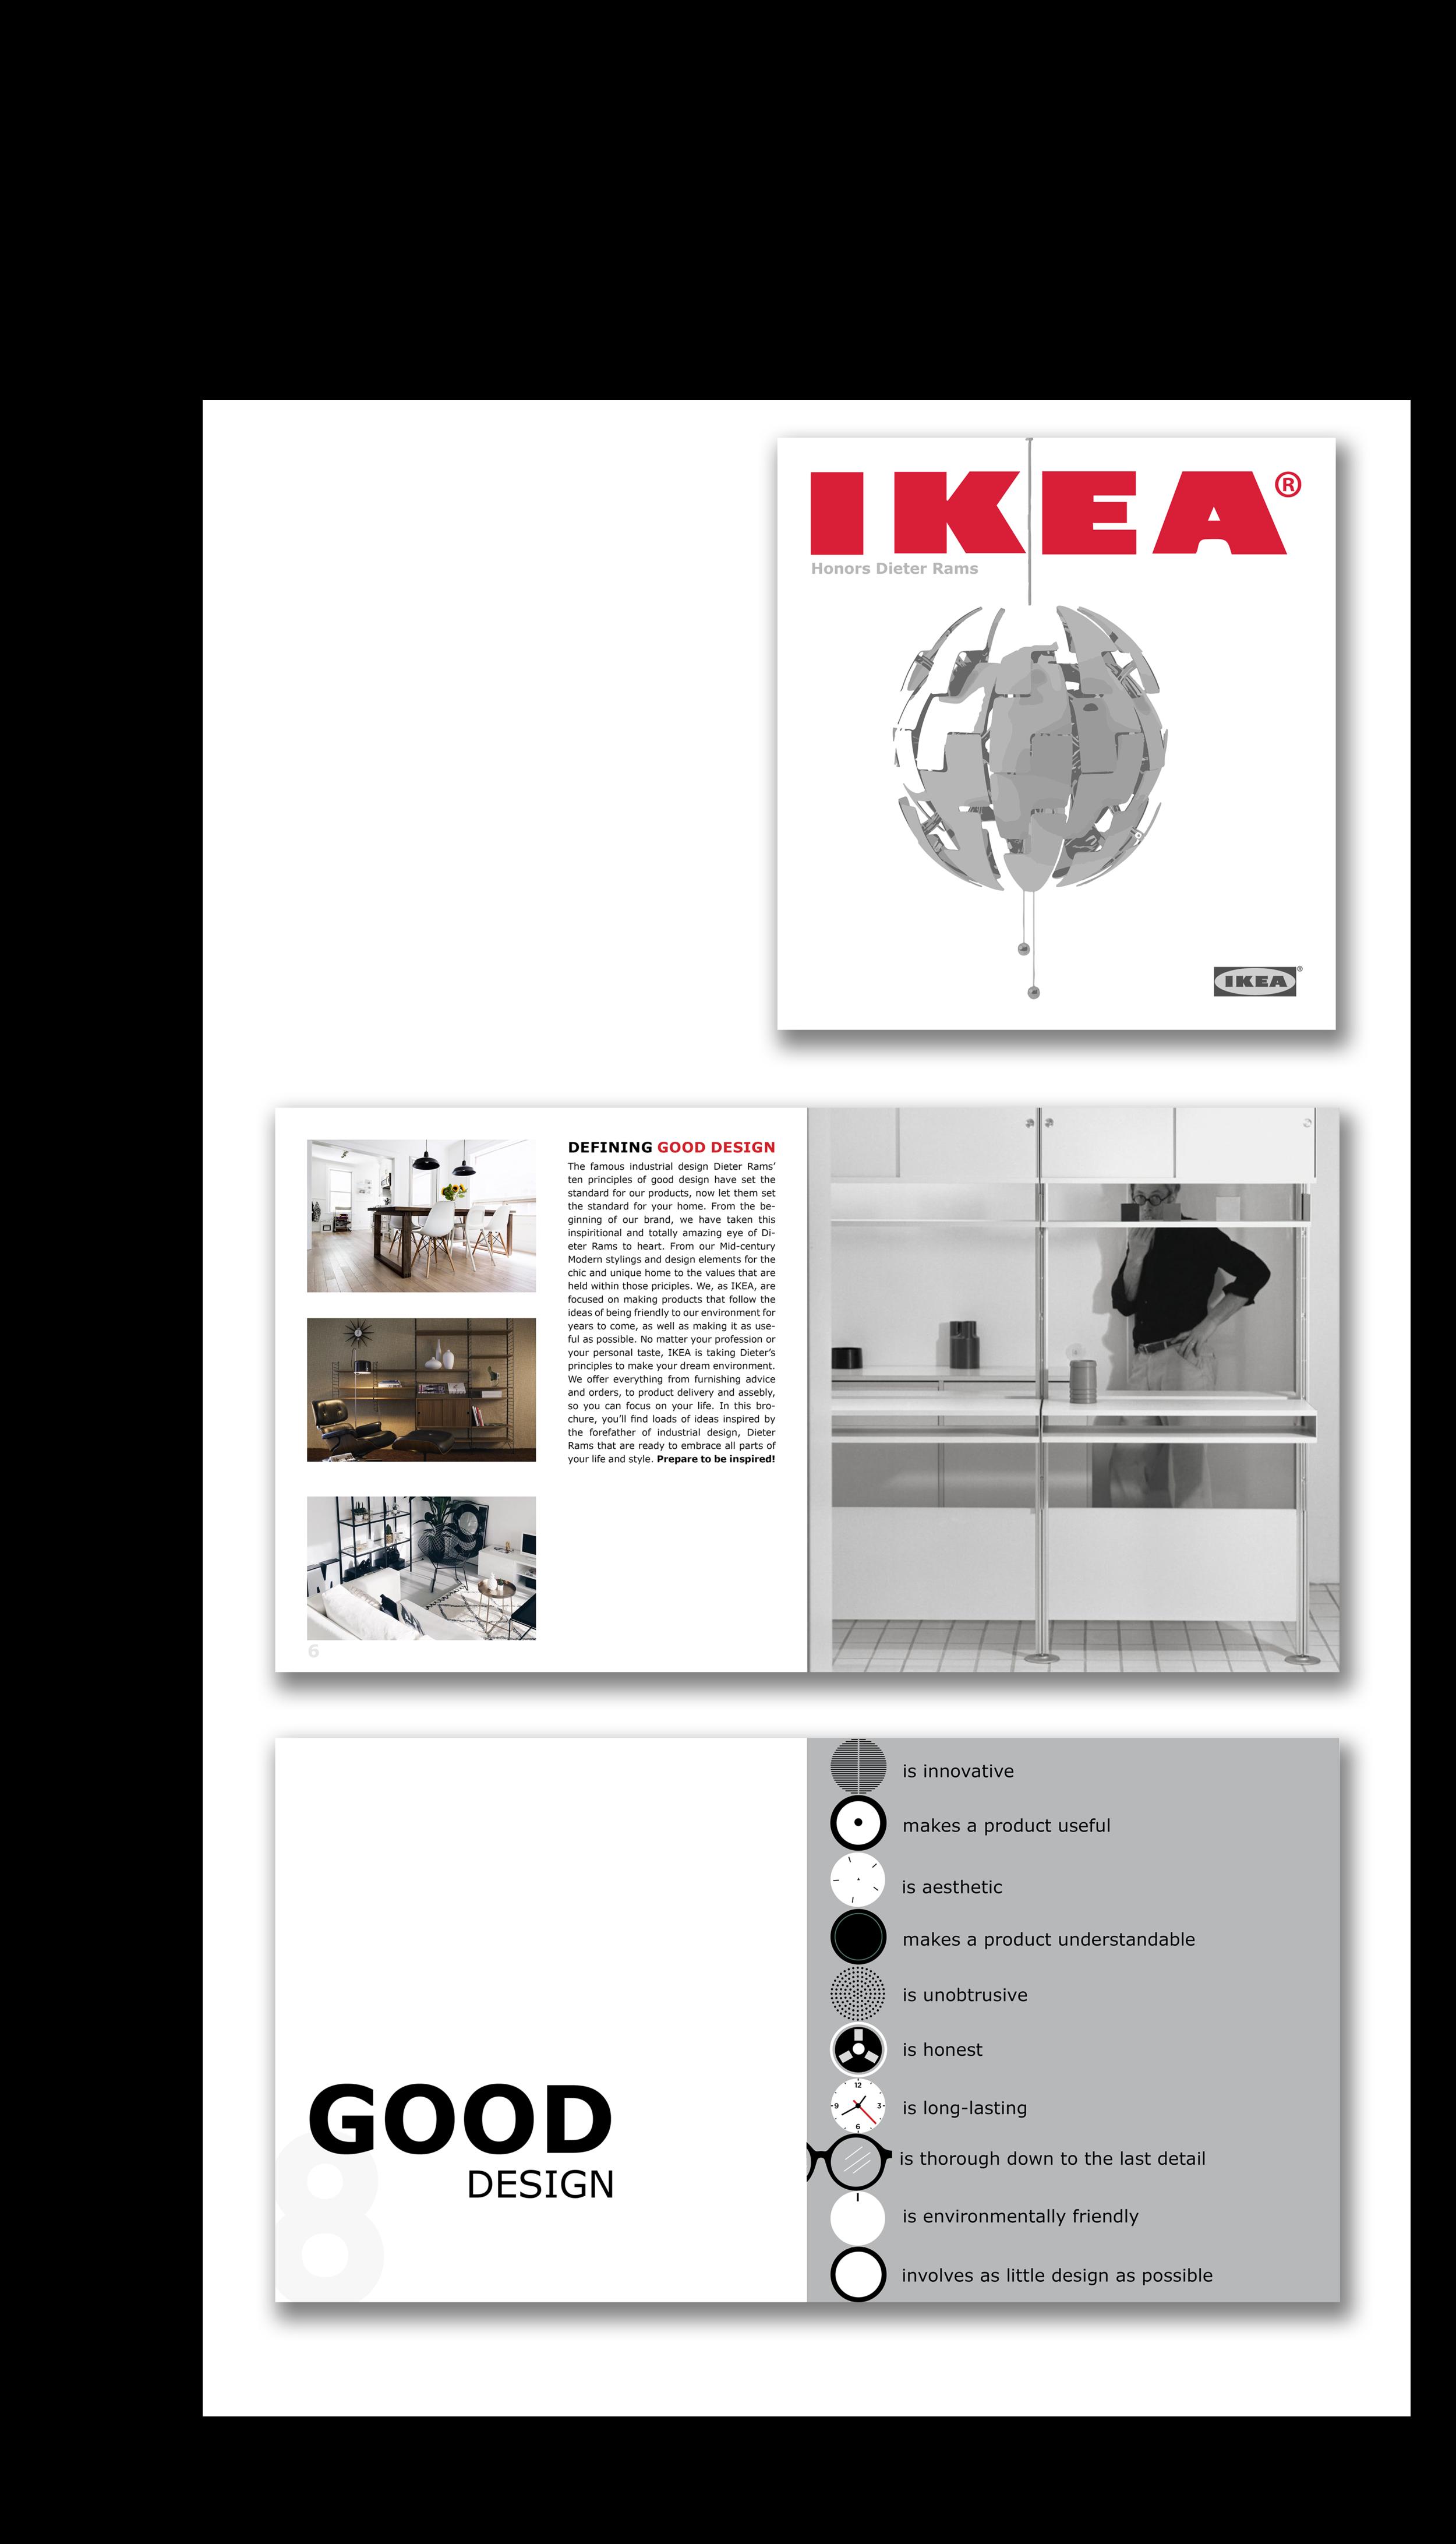 Ikea_Magazine_Website.png